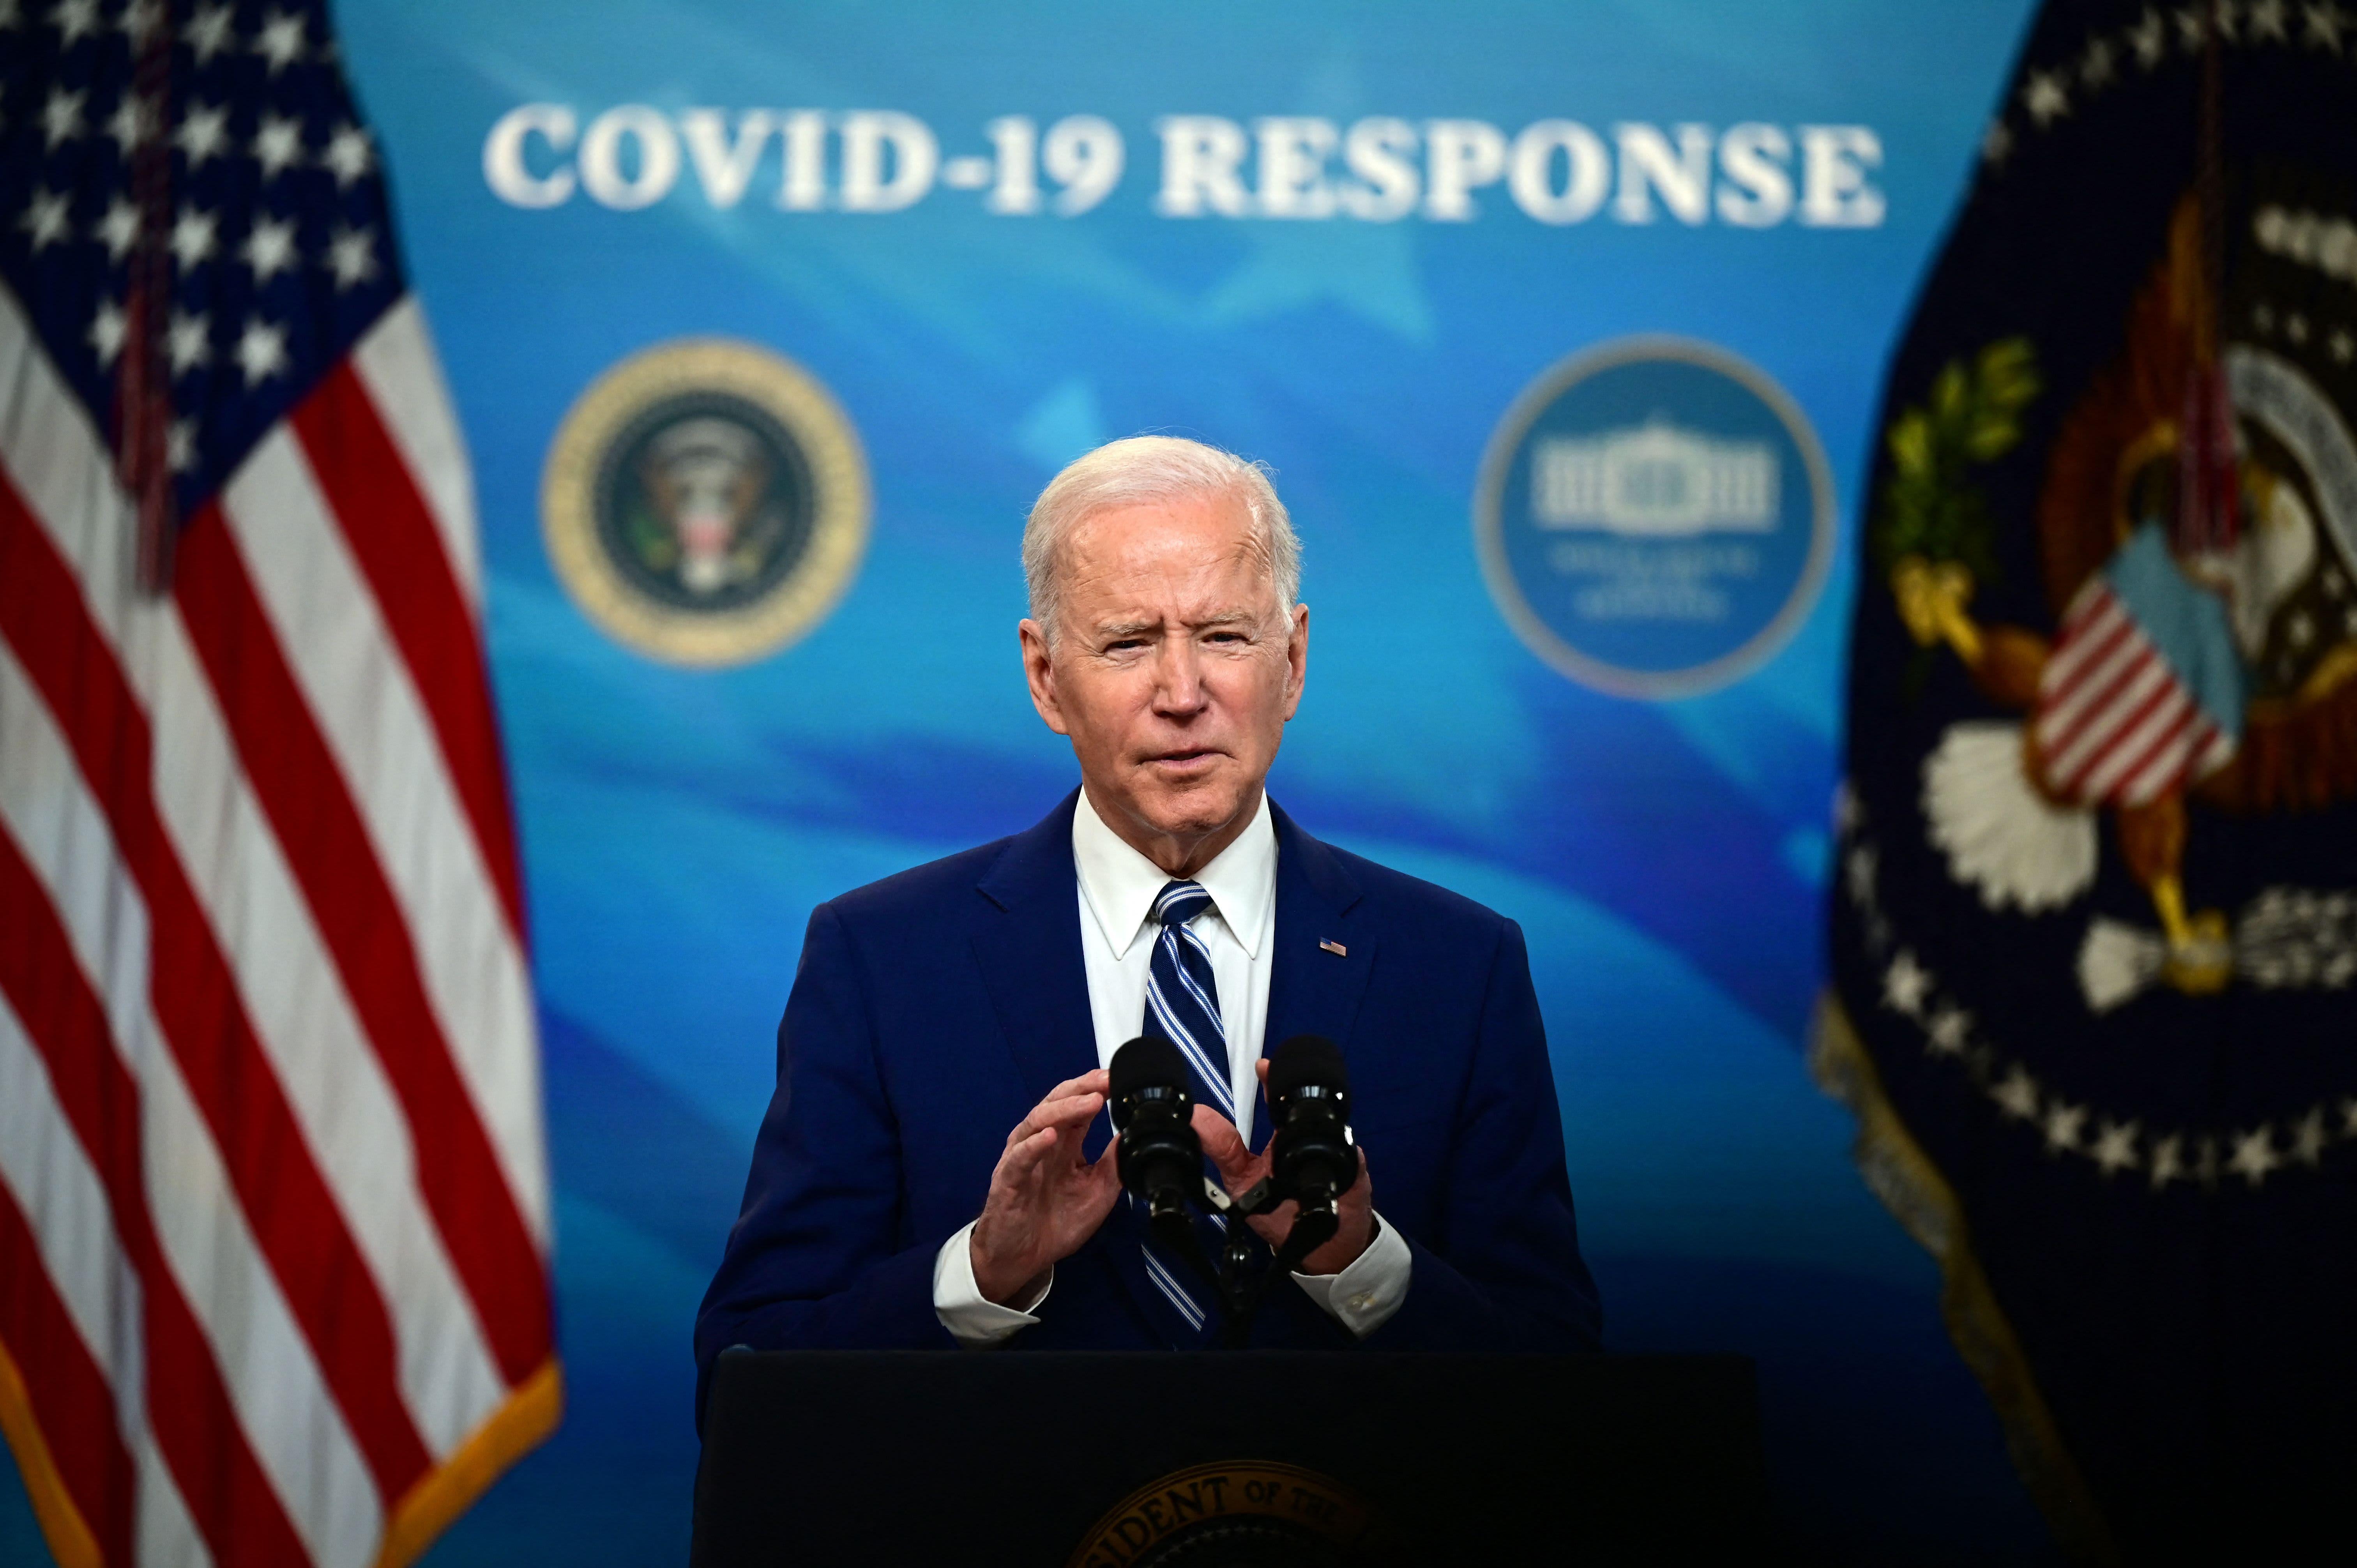 Biden Says Pause on J&J Shots Shows Gov't Putting Safety 1st